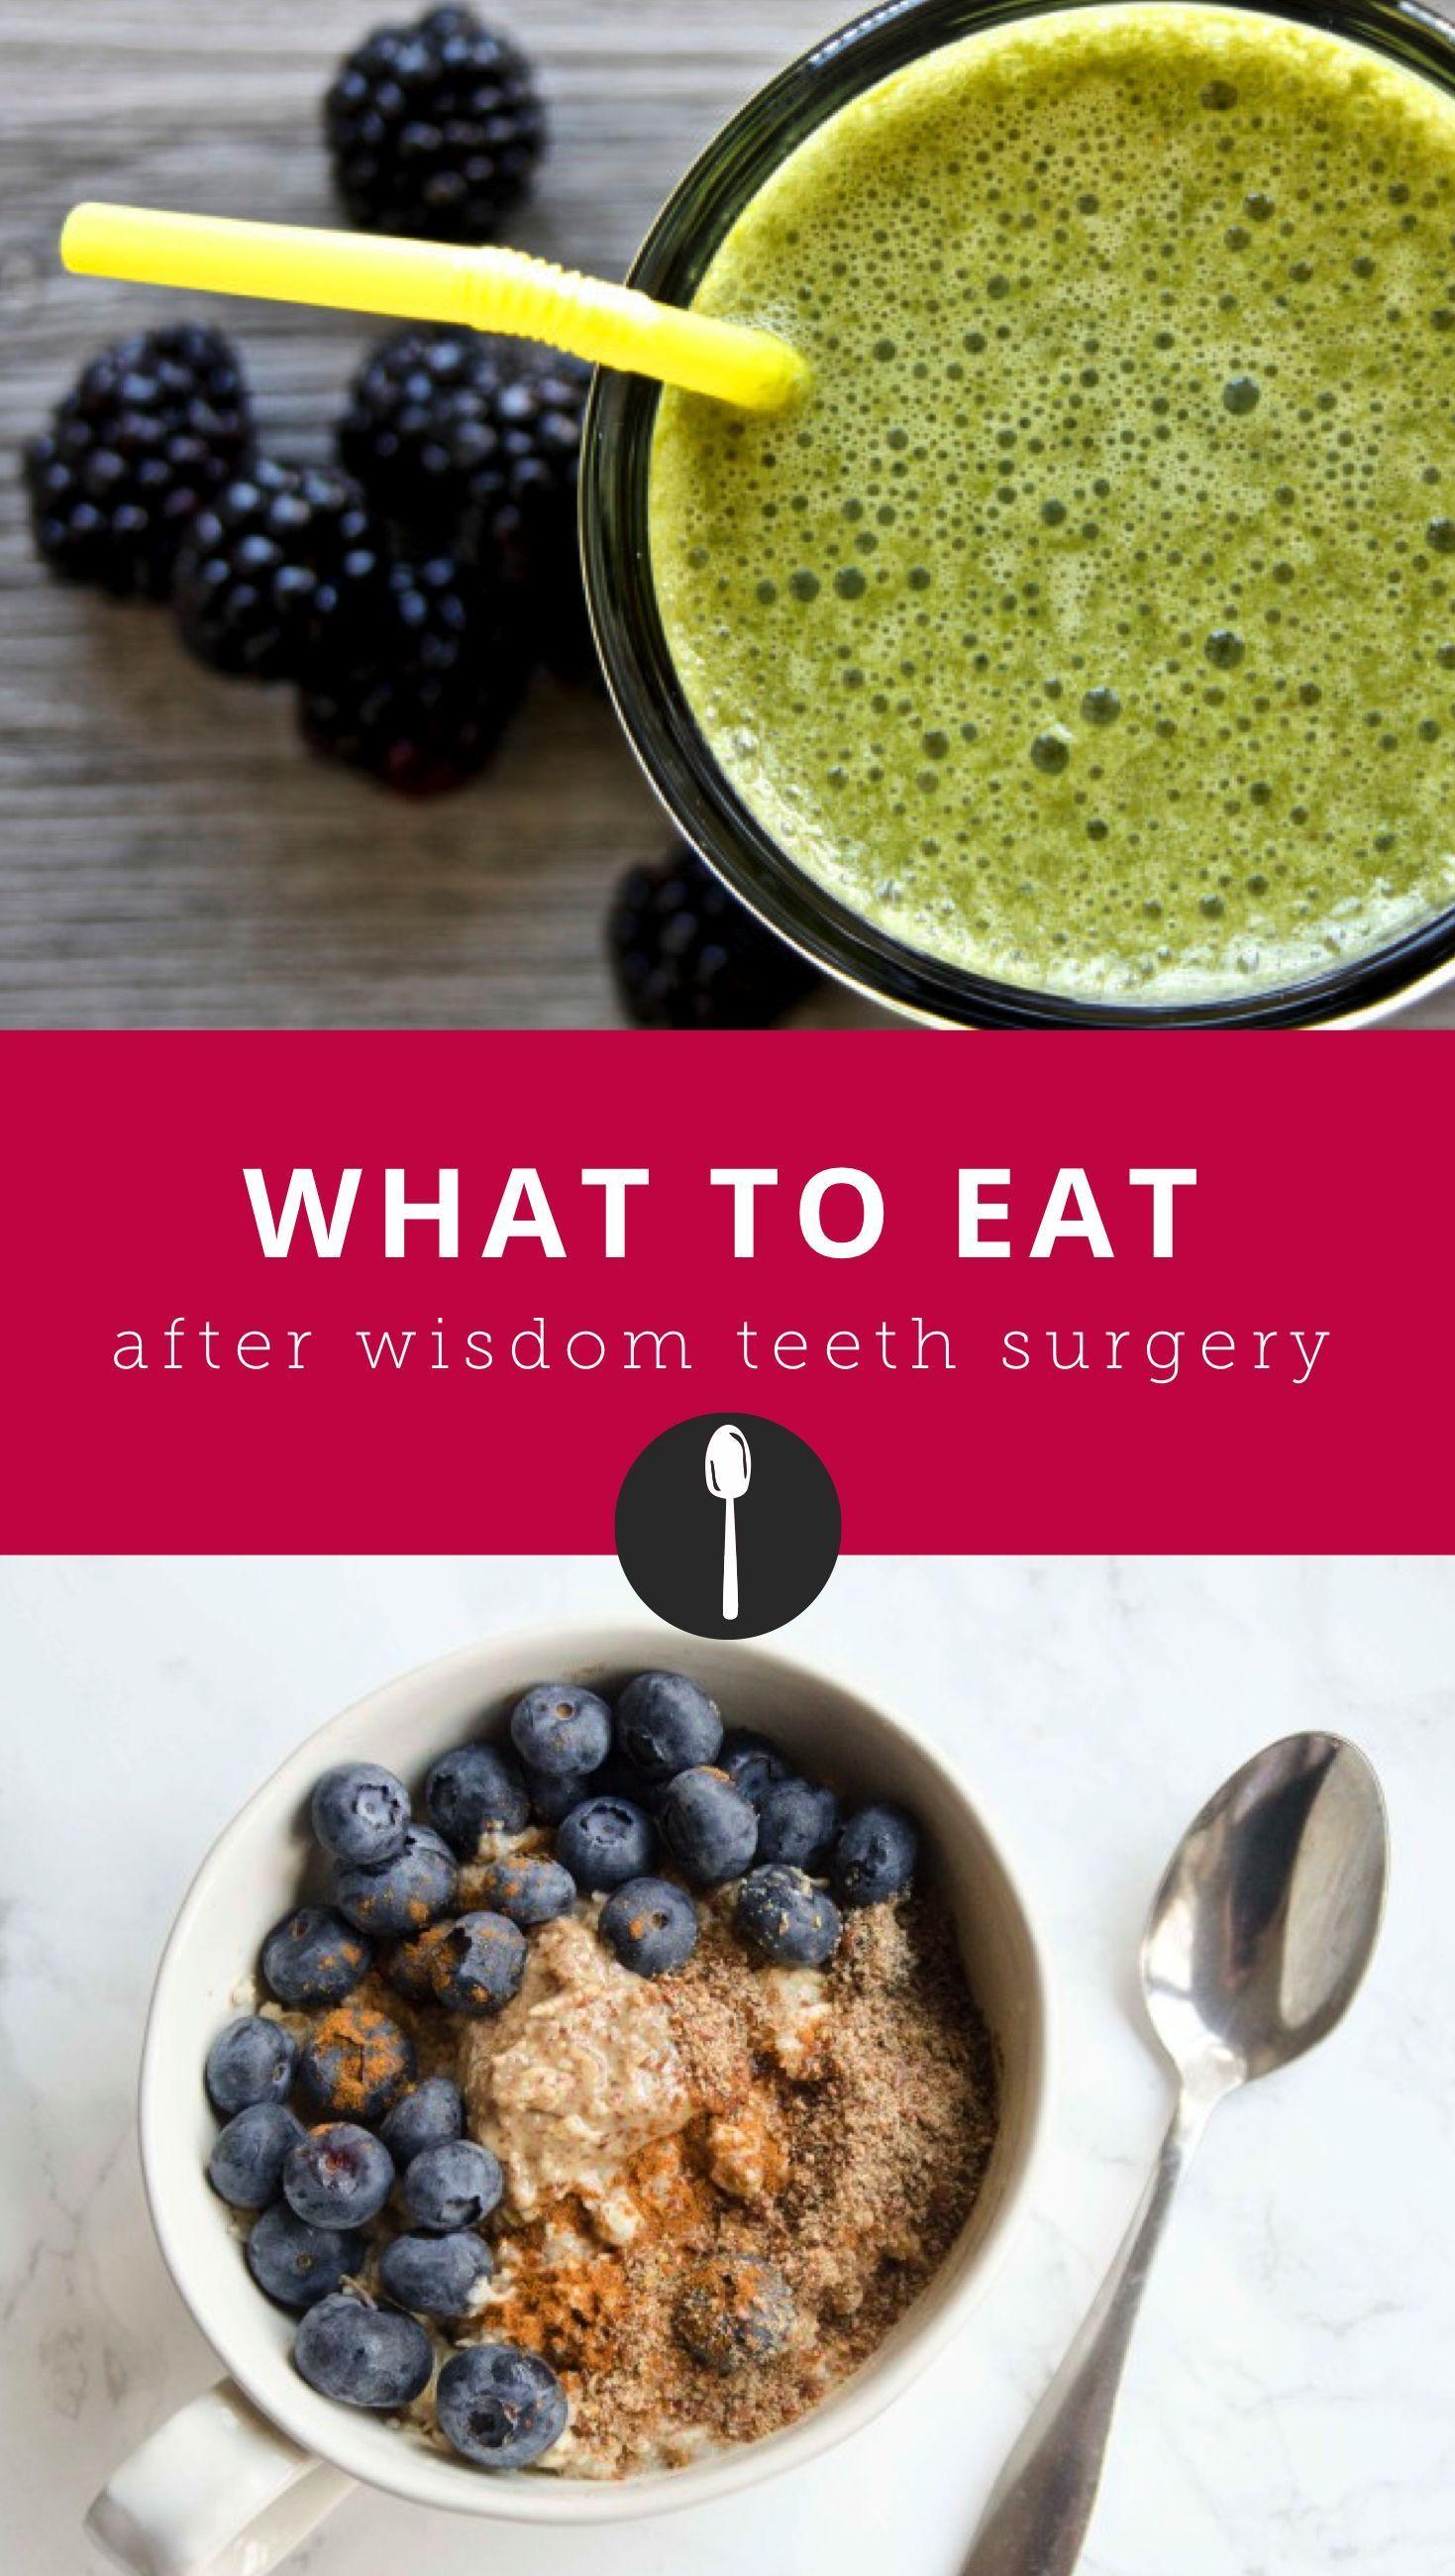 preparing for the tonsilocalypse. soft food diet ftw in